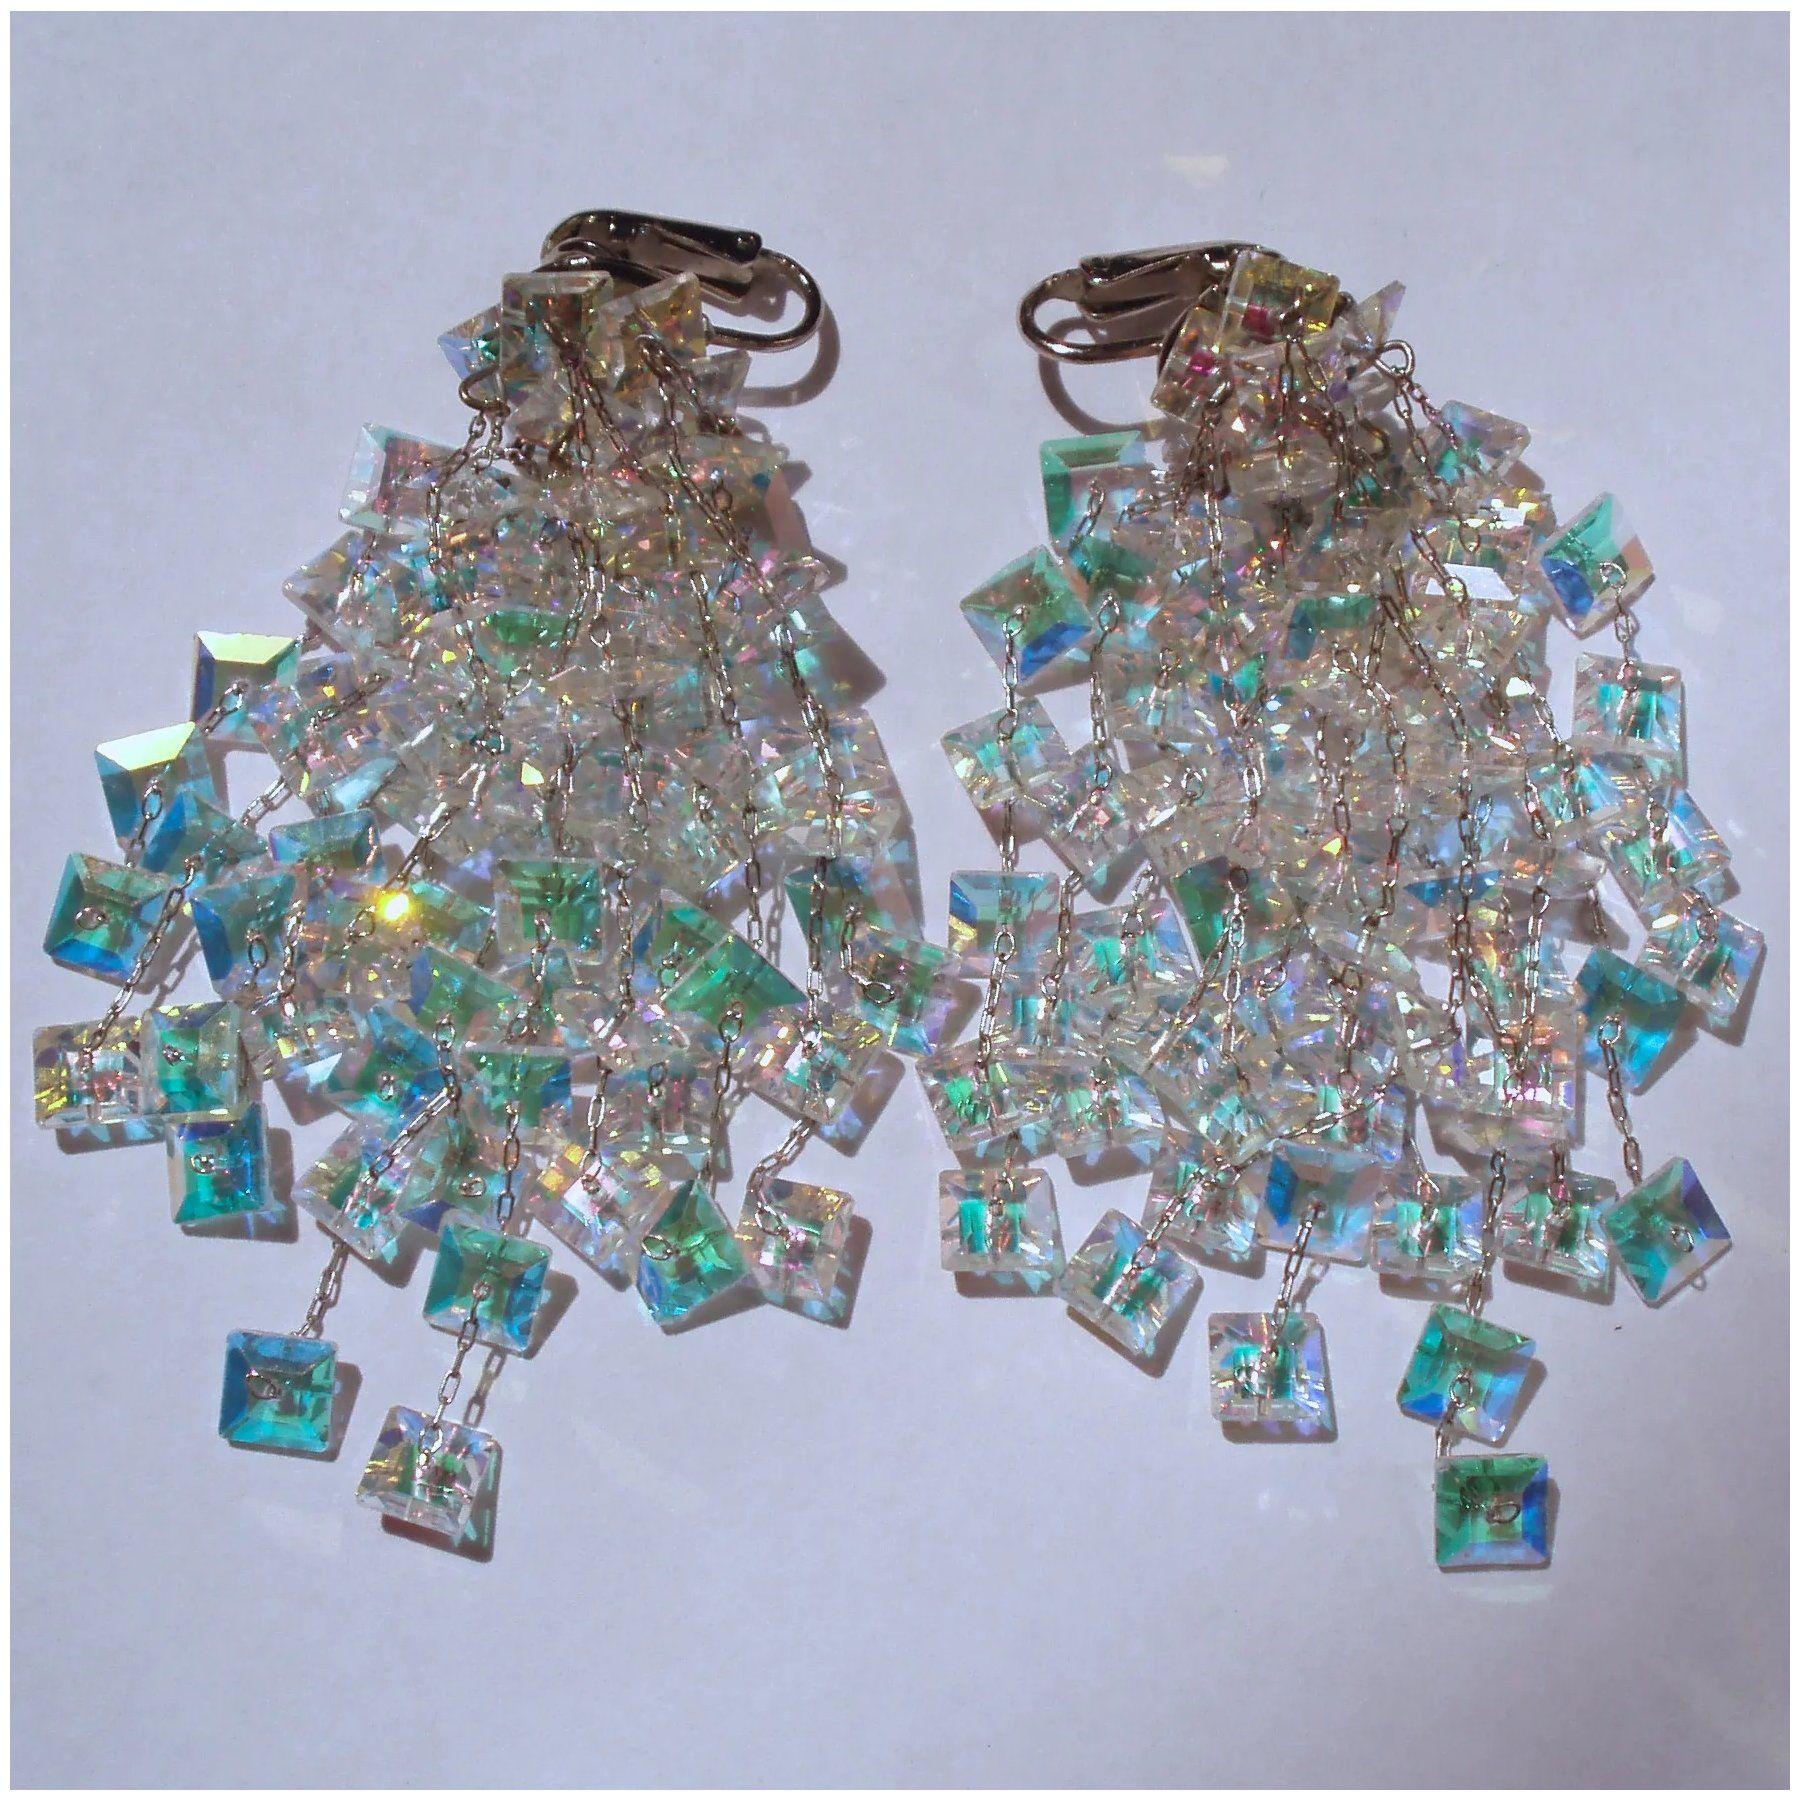 Vintage Rainbow Crystal Chandelier Showstopper Earrings in